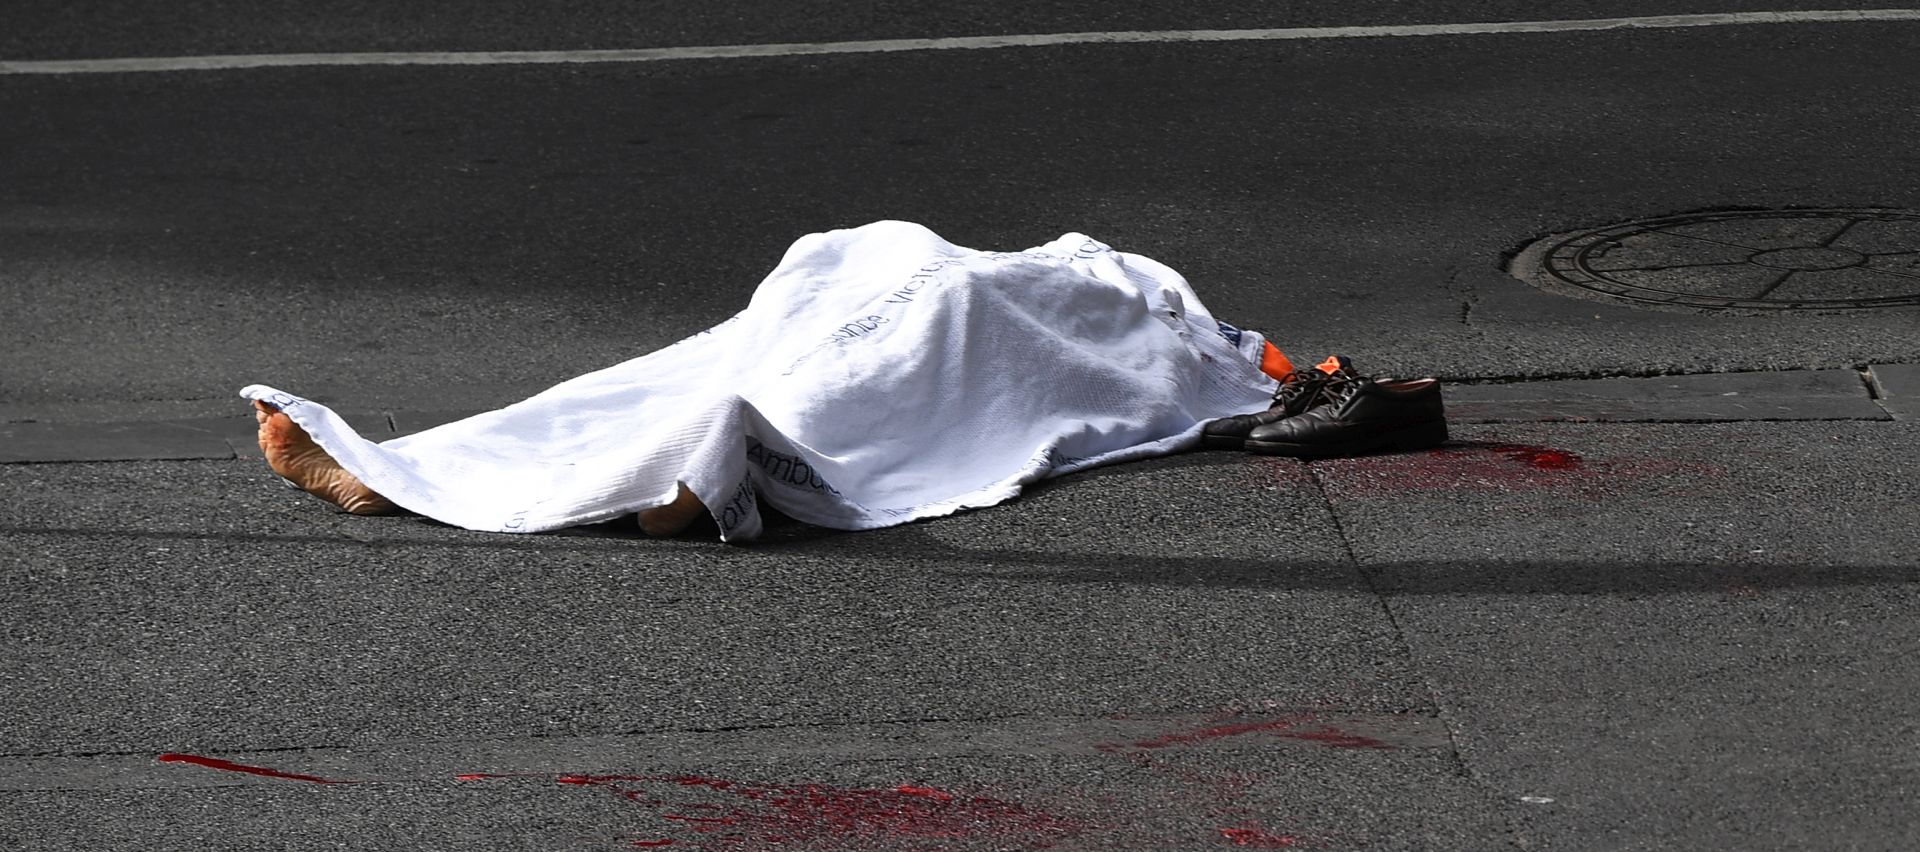 MELBOURNE Krvavi napad nožem